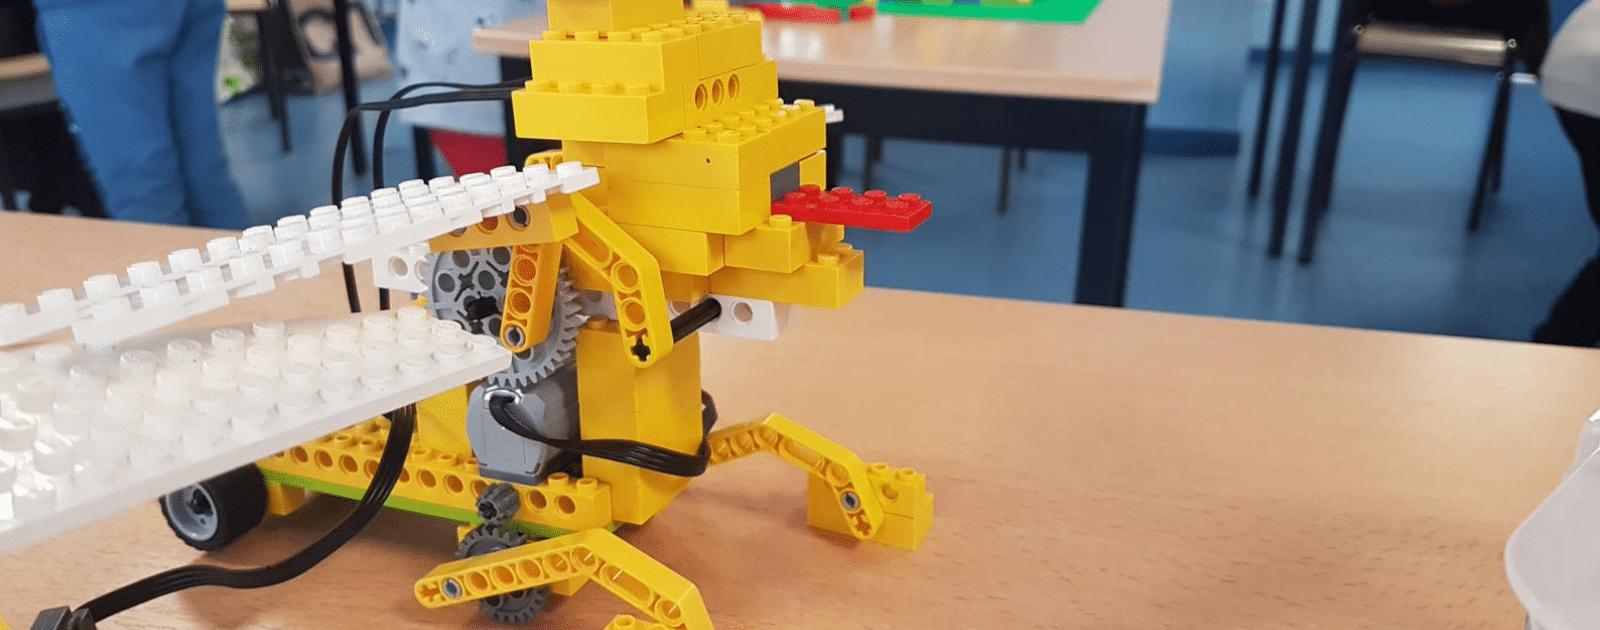 Construction briques LEGO